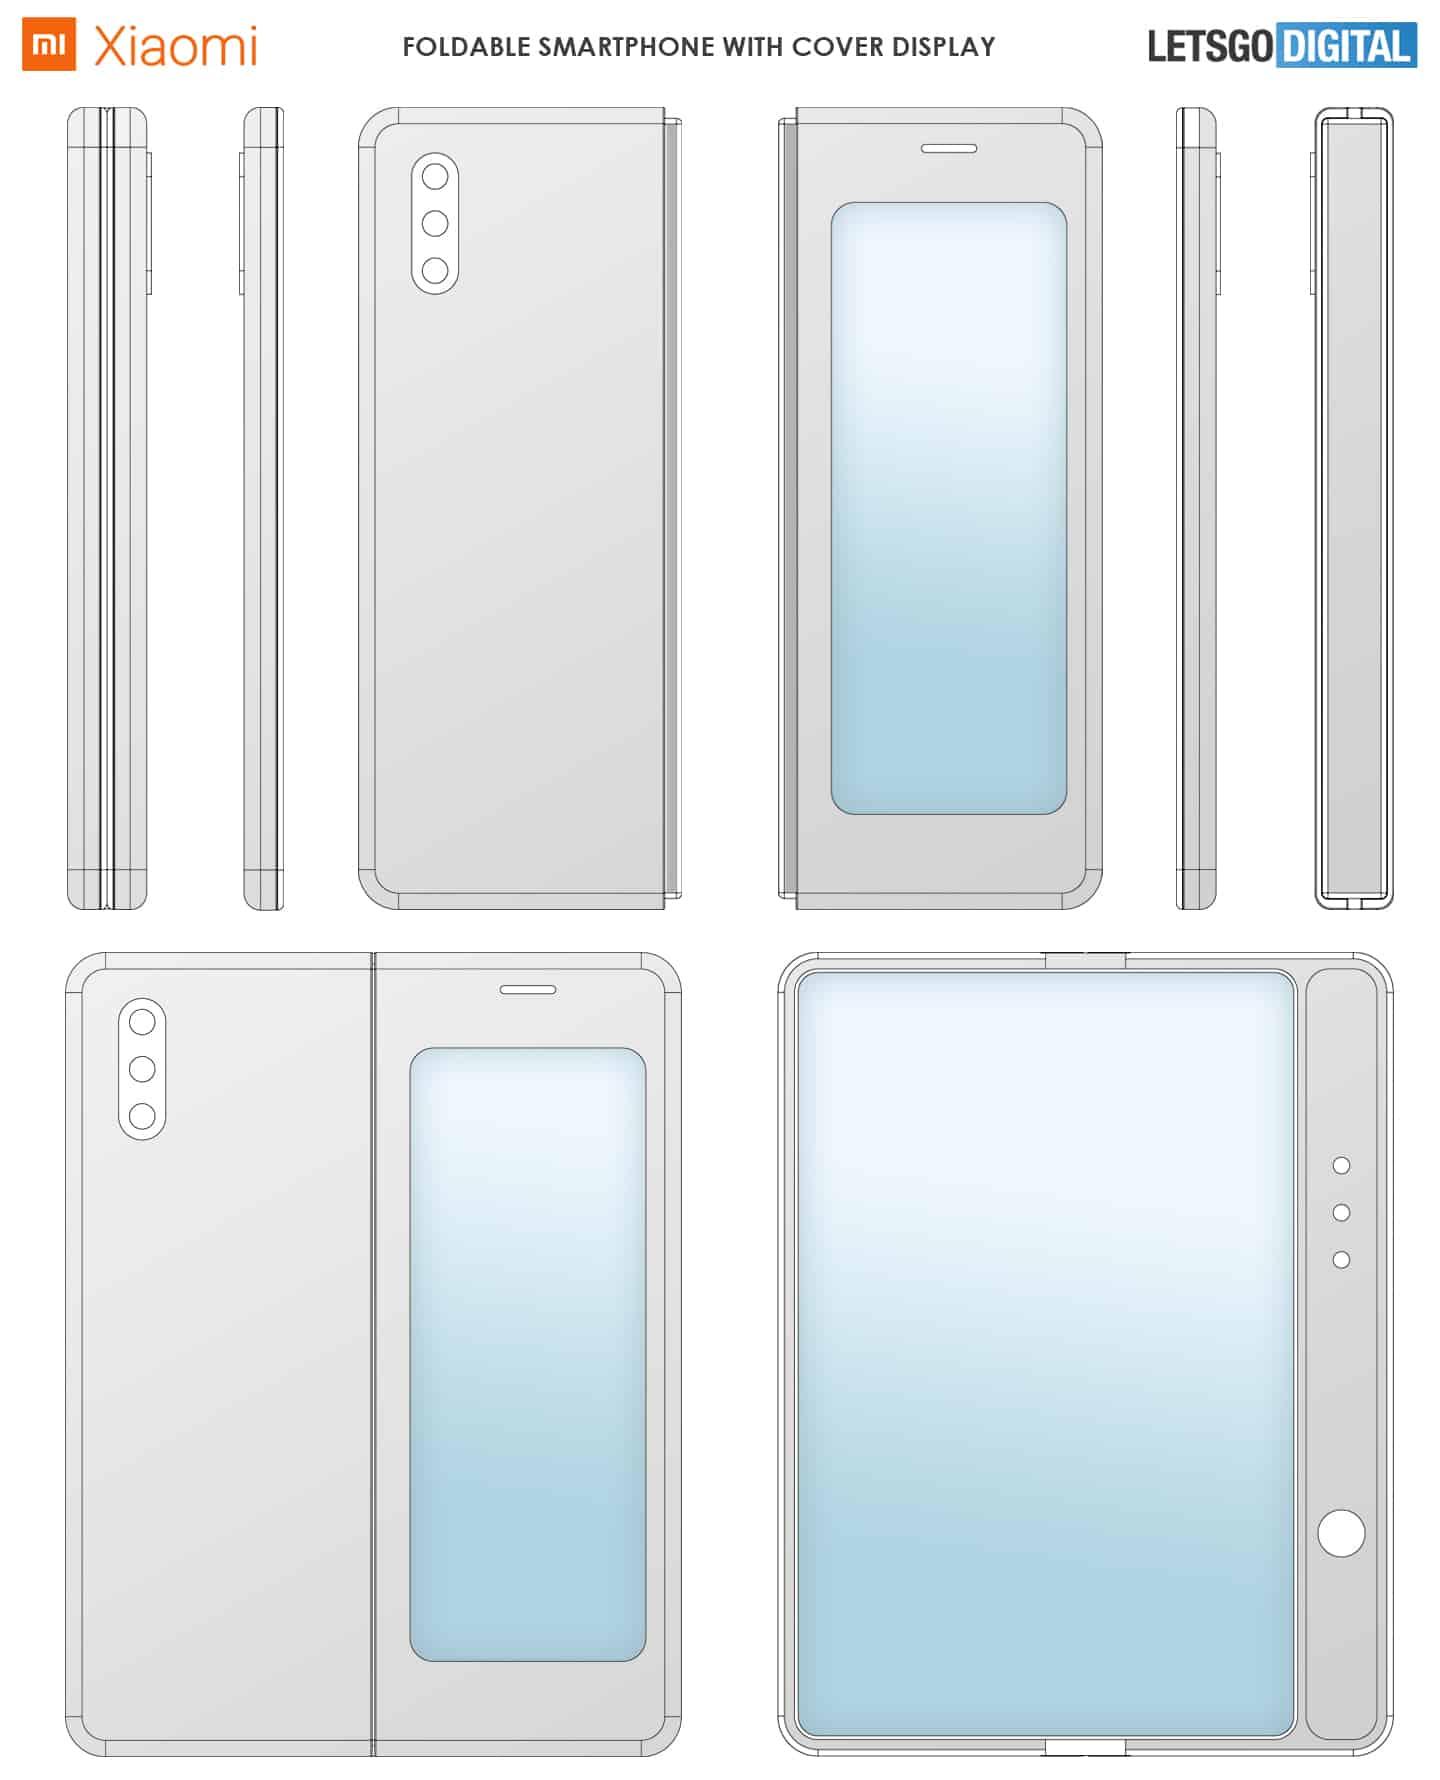 Ponsel Layar Lipat Xiaomi mirip dengan Samsung Galaxy Fold?